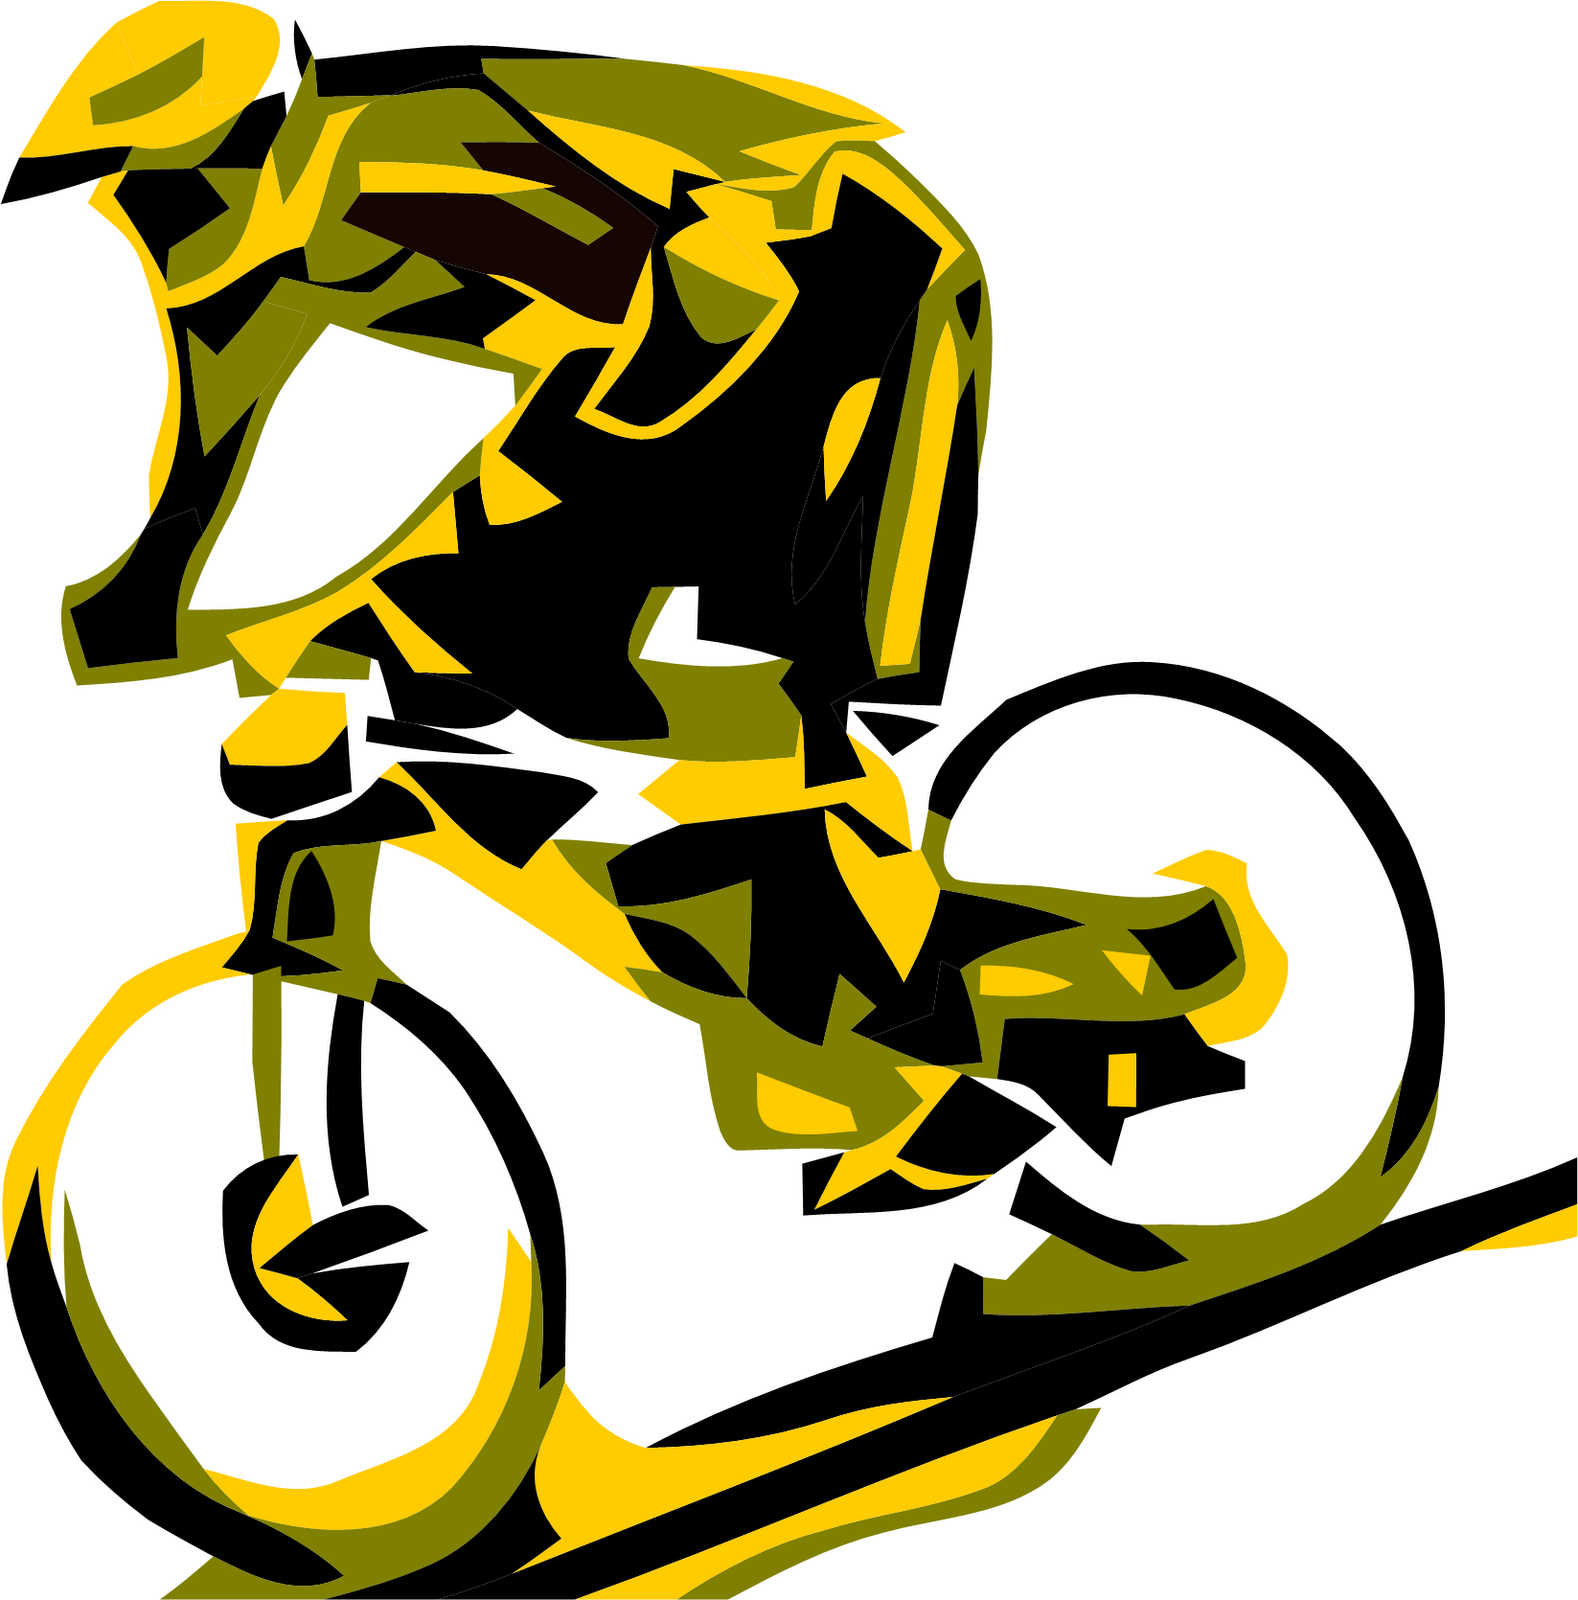 http://2.bp.blogspot.com/_dDUHPa7QgaM/TAjpq5N0sEI/AAAAAAAADkM/vp3z_EWQkE4/s1600/DH+MTB+Rider+Cedric+Garcia+T+shirt+Design+Print.png